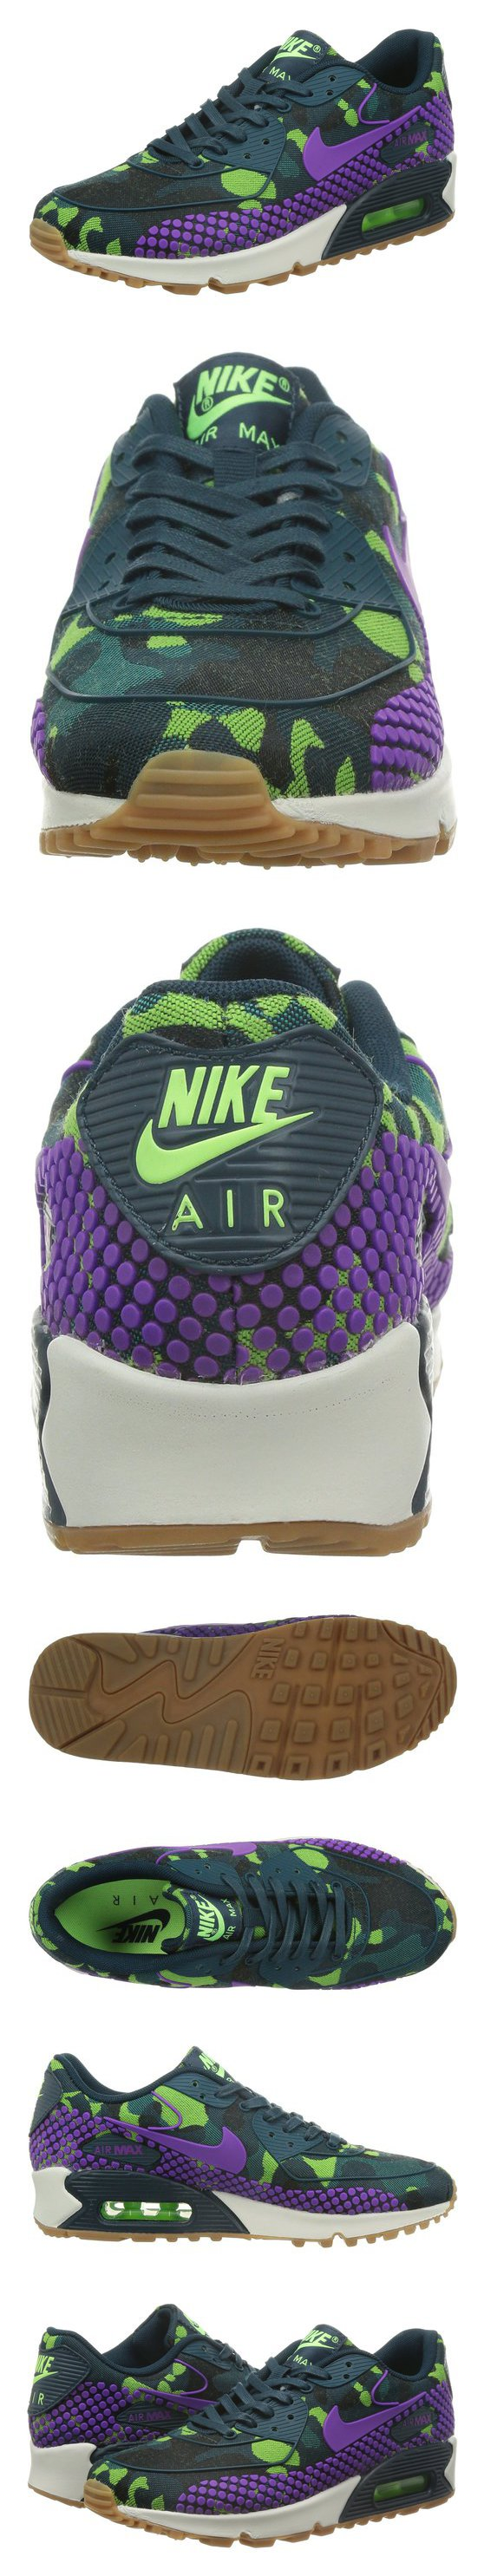 90 Nike Women's Wmns Air Max 90 JCRD PRM TEAL/VIVID